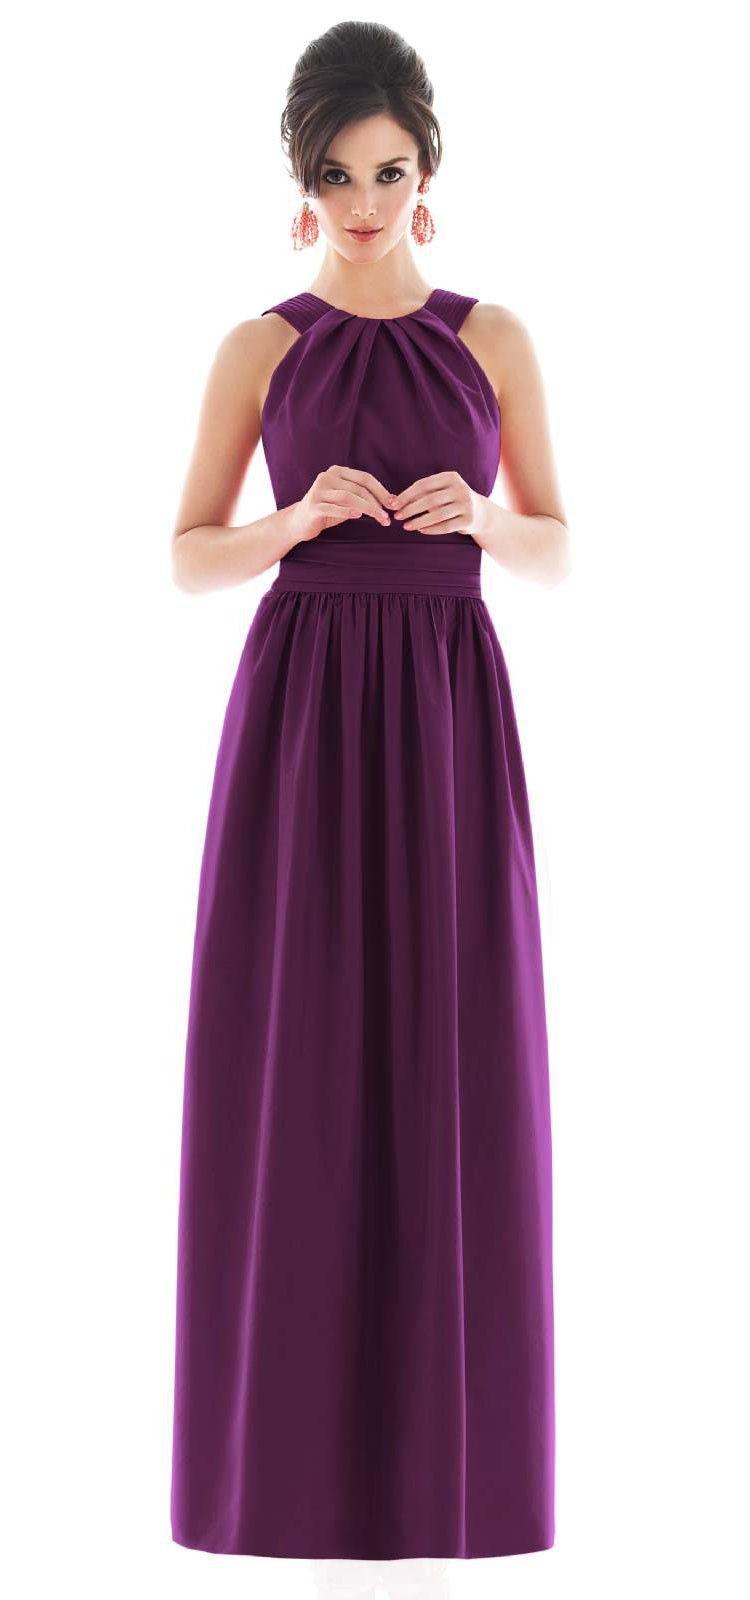 Alfred Sung Bridesmaid Dresses - Style D495 - Peau de Soie | Weddington Way  | Weddington Way, $198